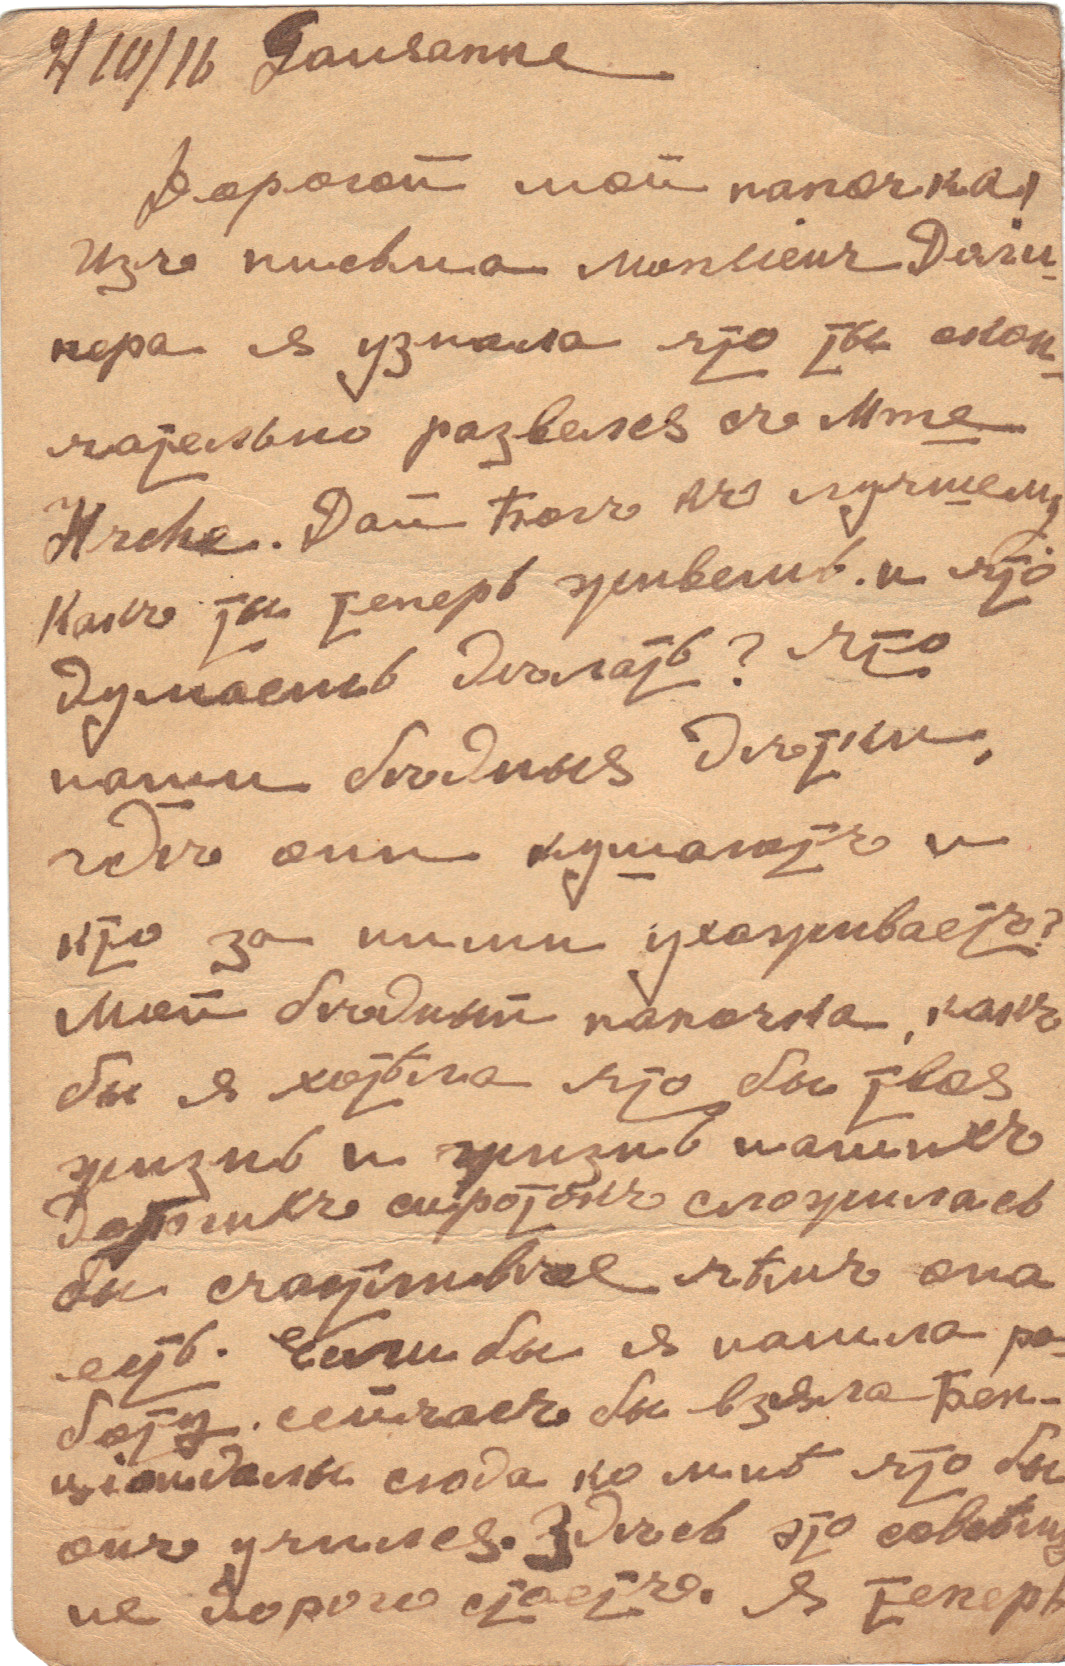 Postcard to M Dechtar from Nina October 2, 1916 B